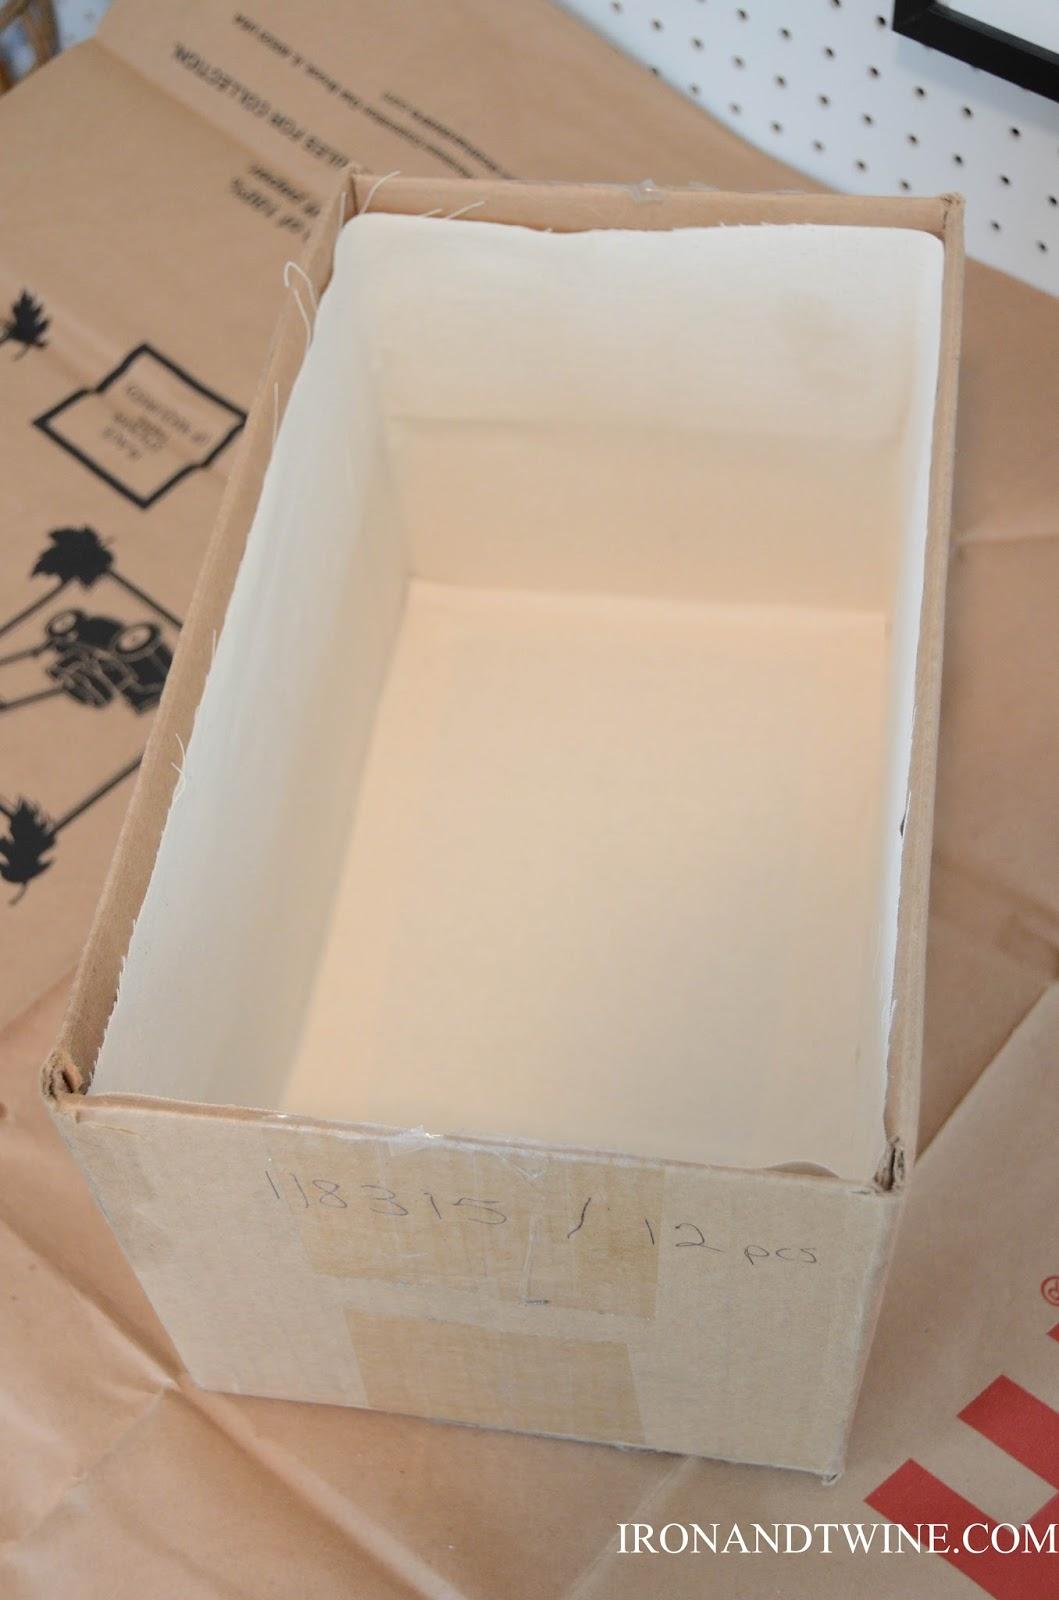 DIY+Belt+Handled+Box,+DIY+fabric+covered+box,+Iron+and+Twine+(21).jpg